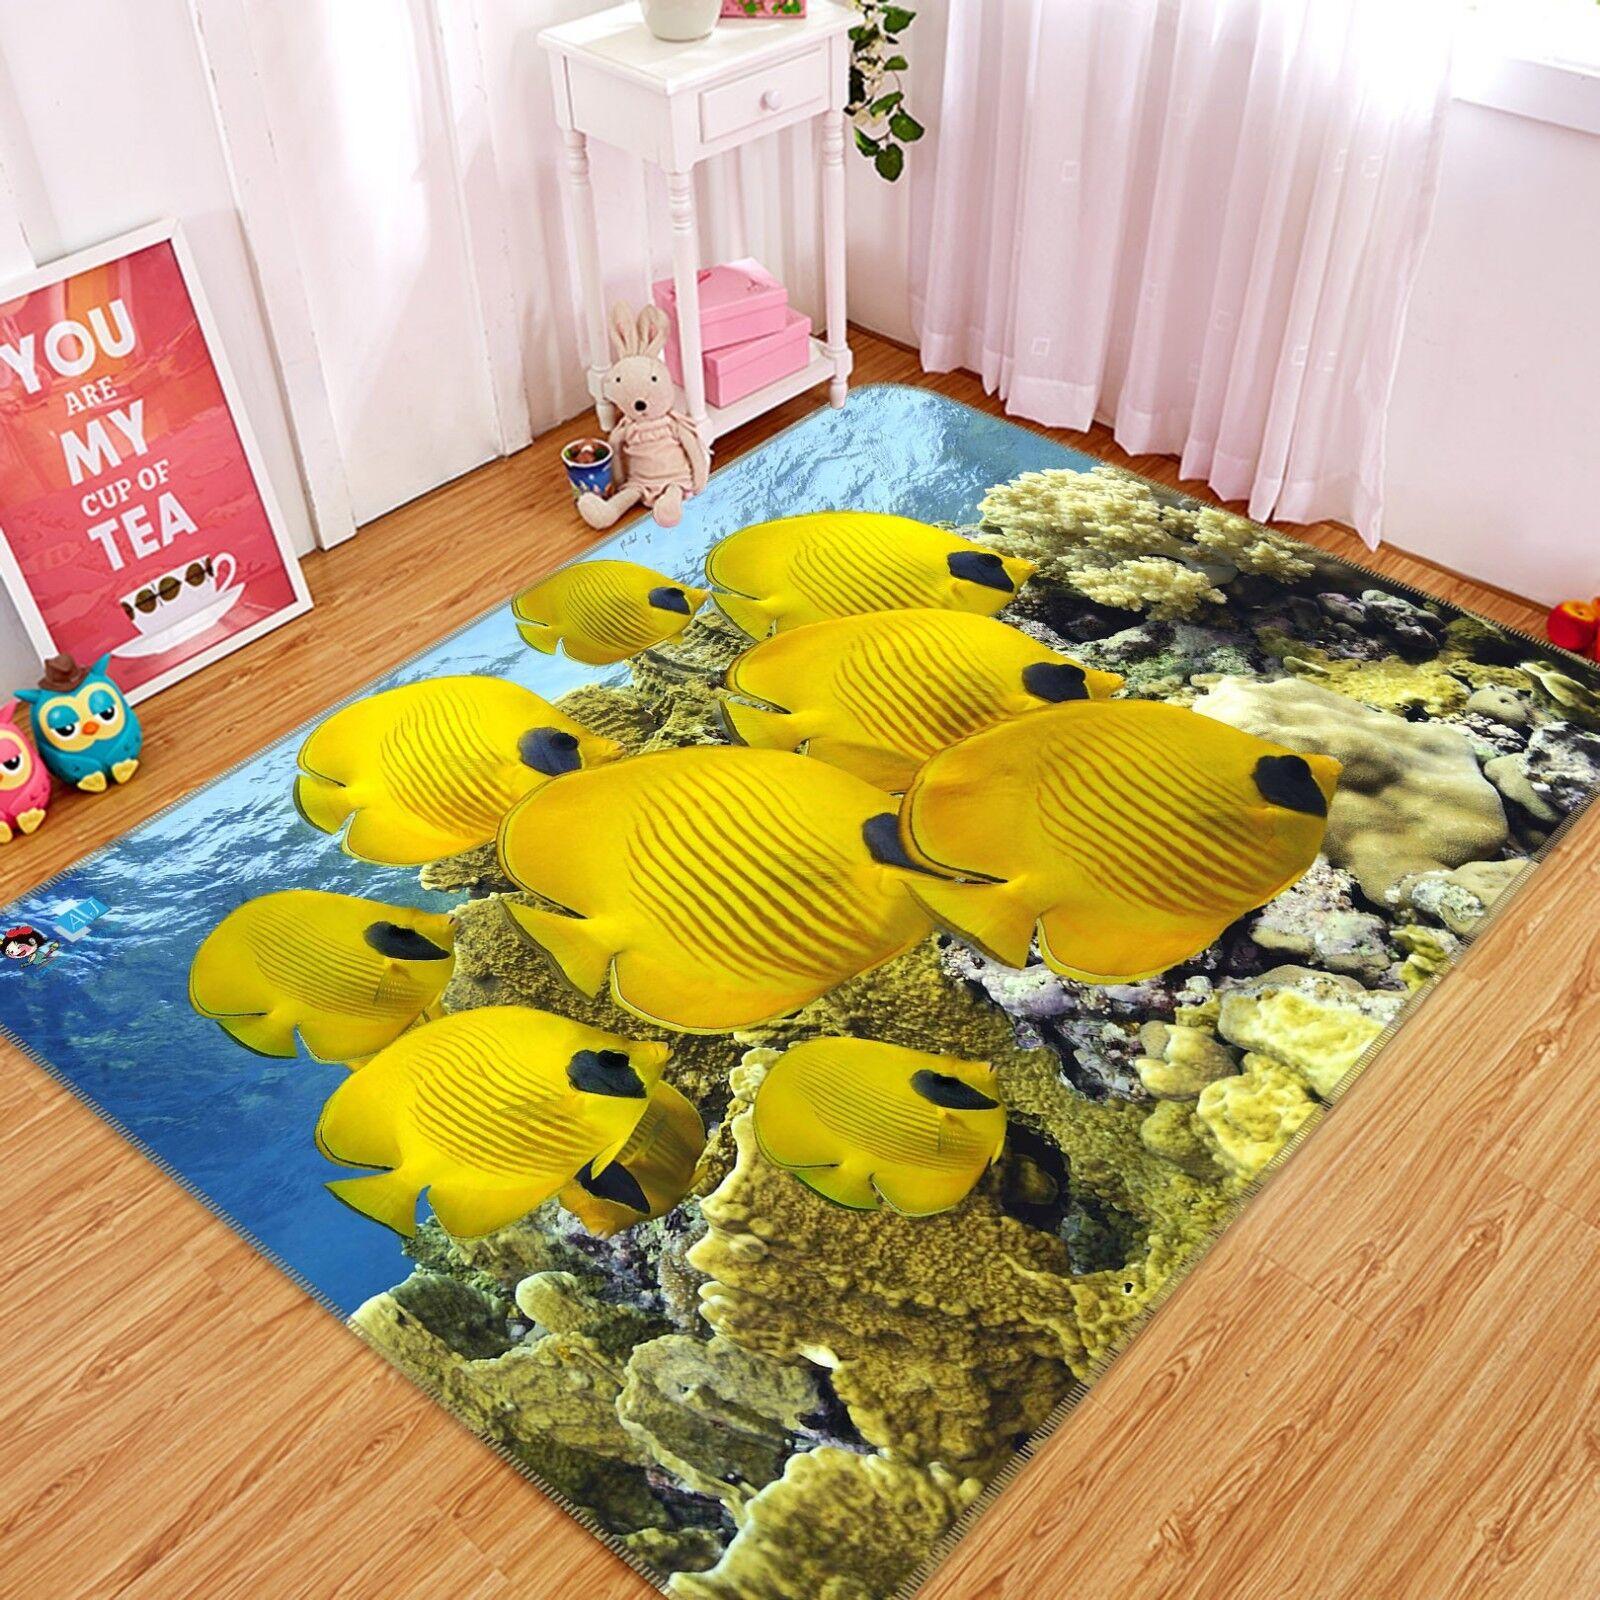 3D Gelb Fish Ocean 7 Non Slip Rug Mat Room Room Room Mat Quality Elegant Photo Carpet UK f263db